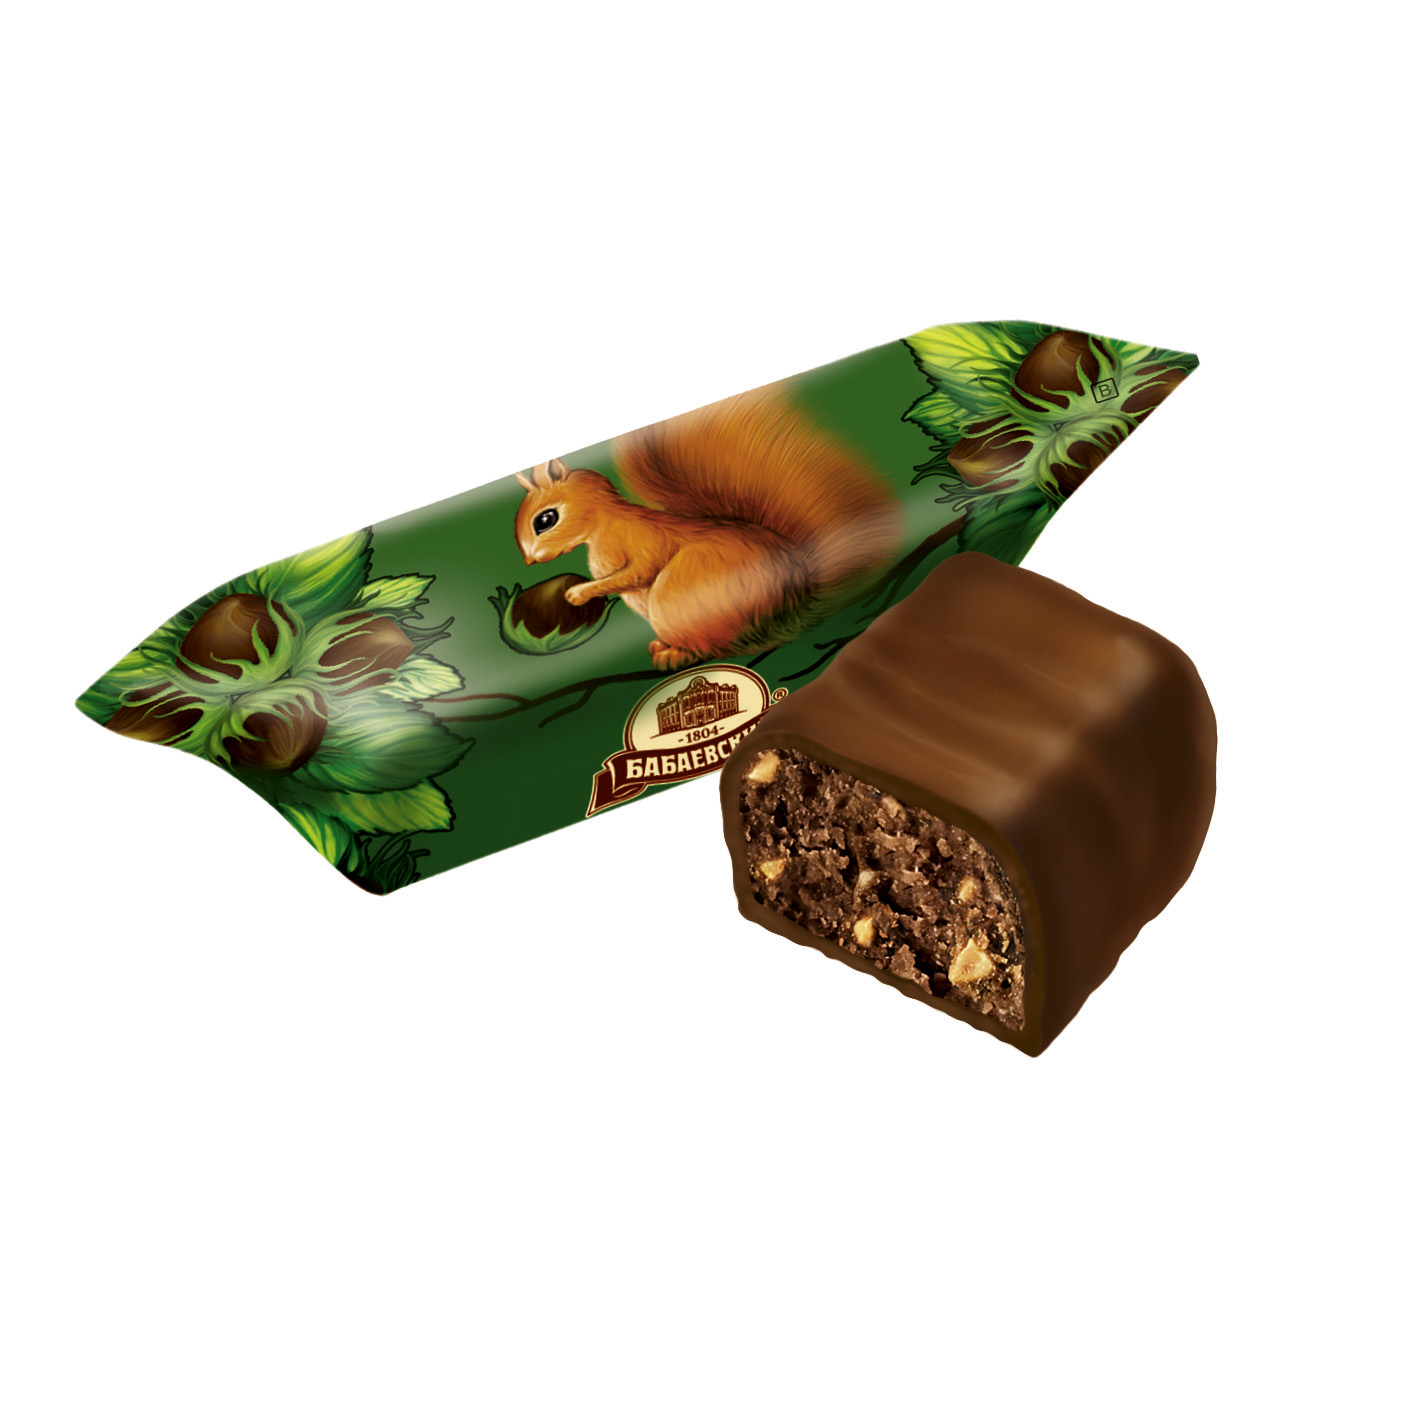 картинки конфет и шоколада